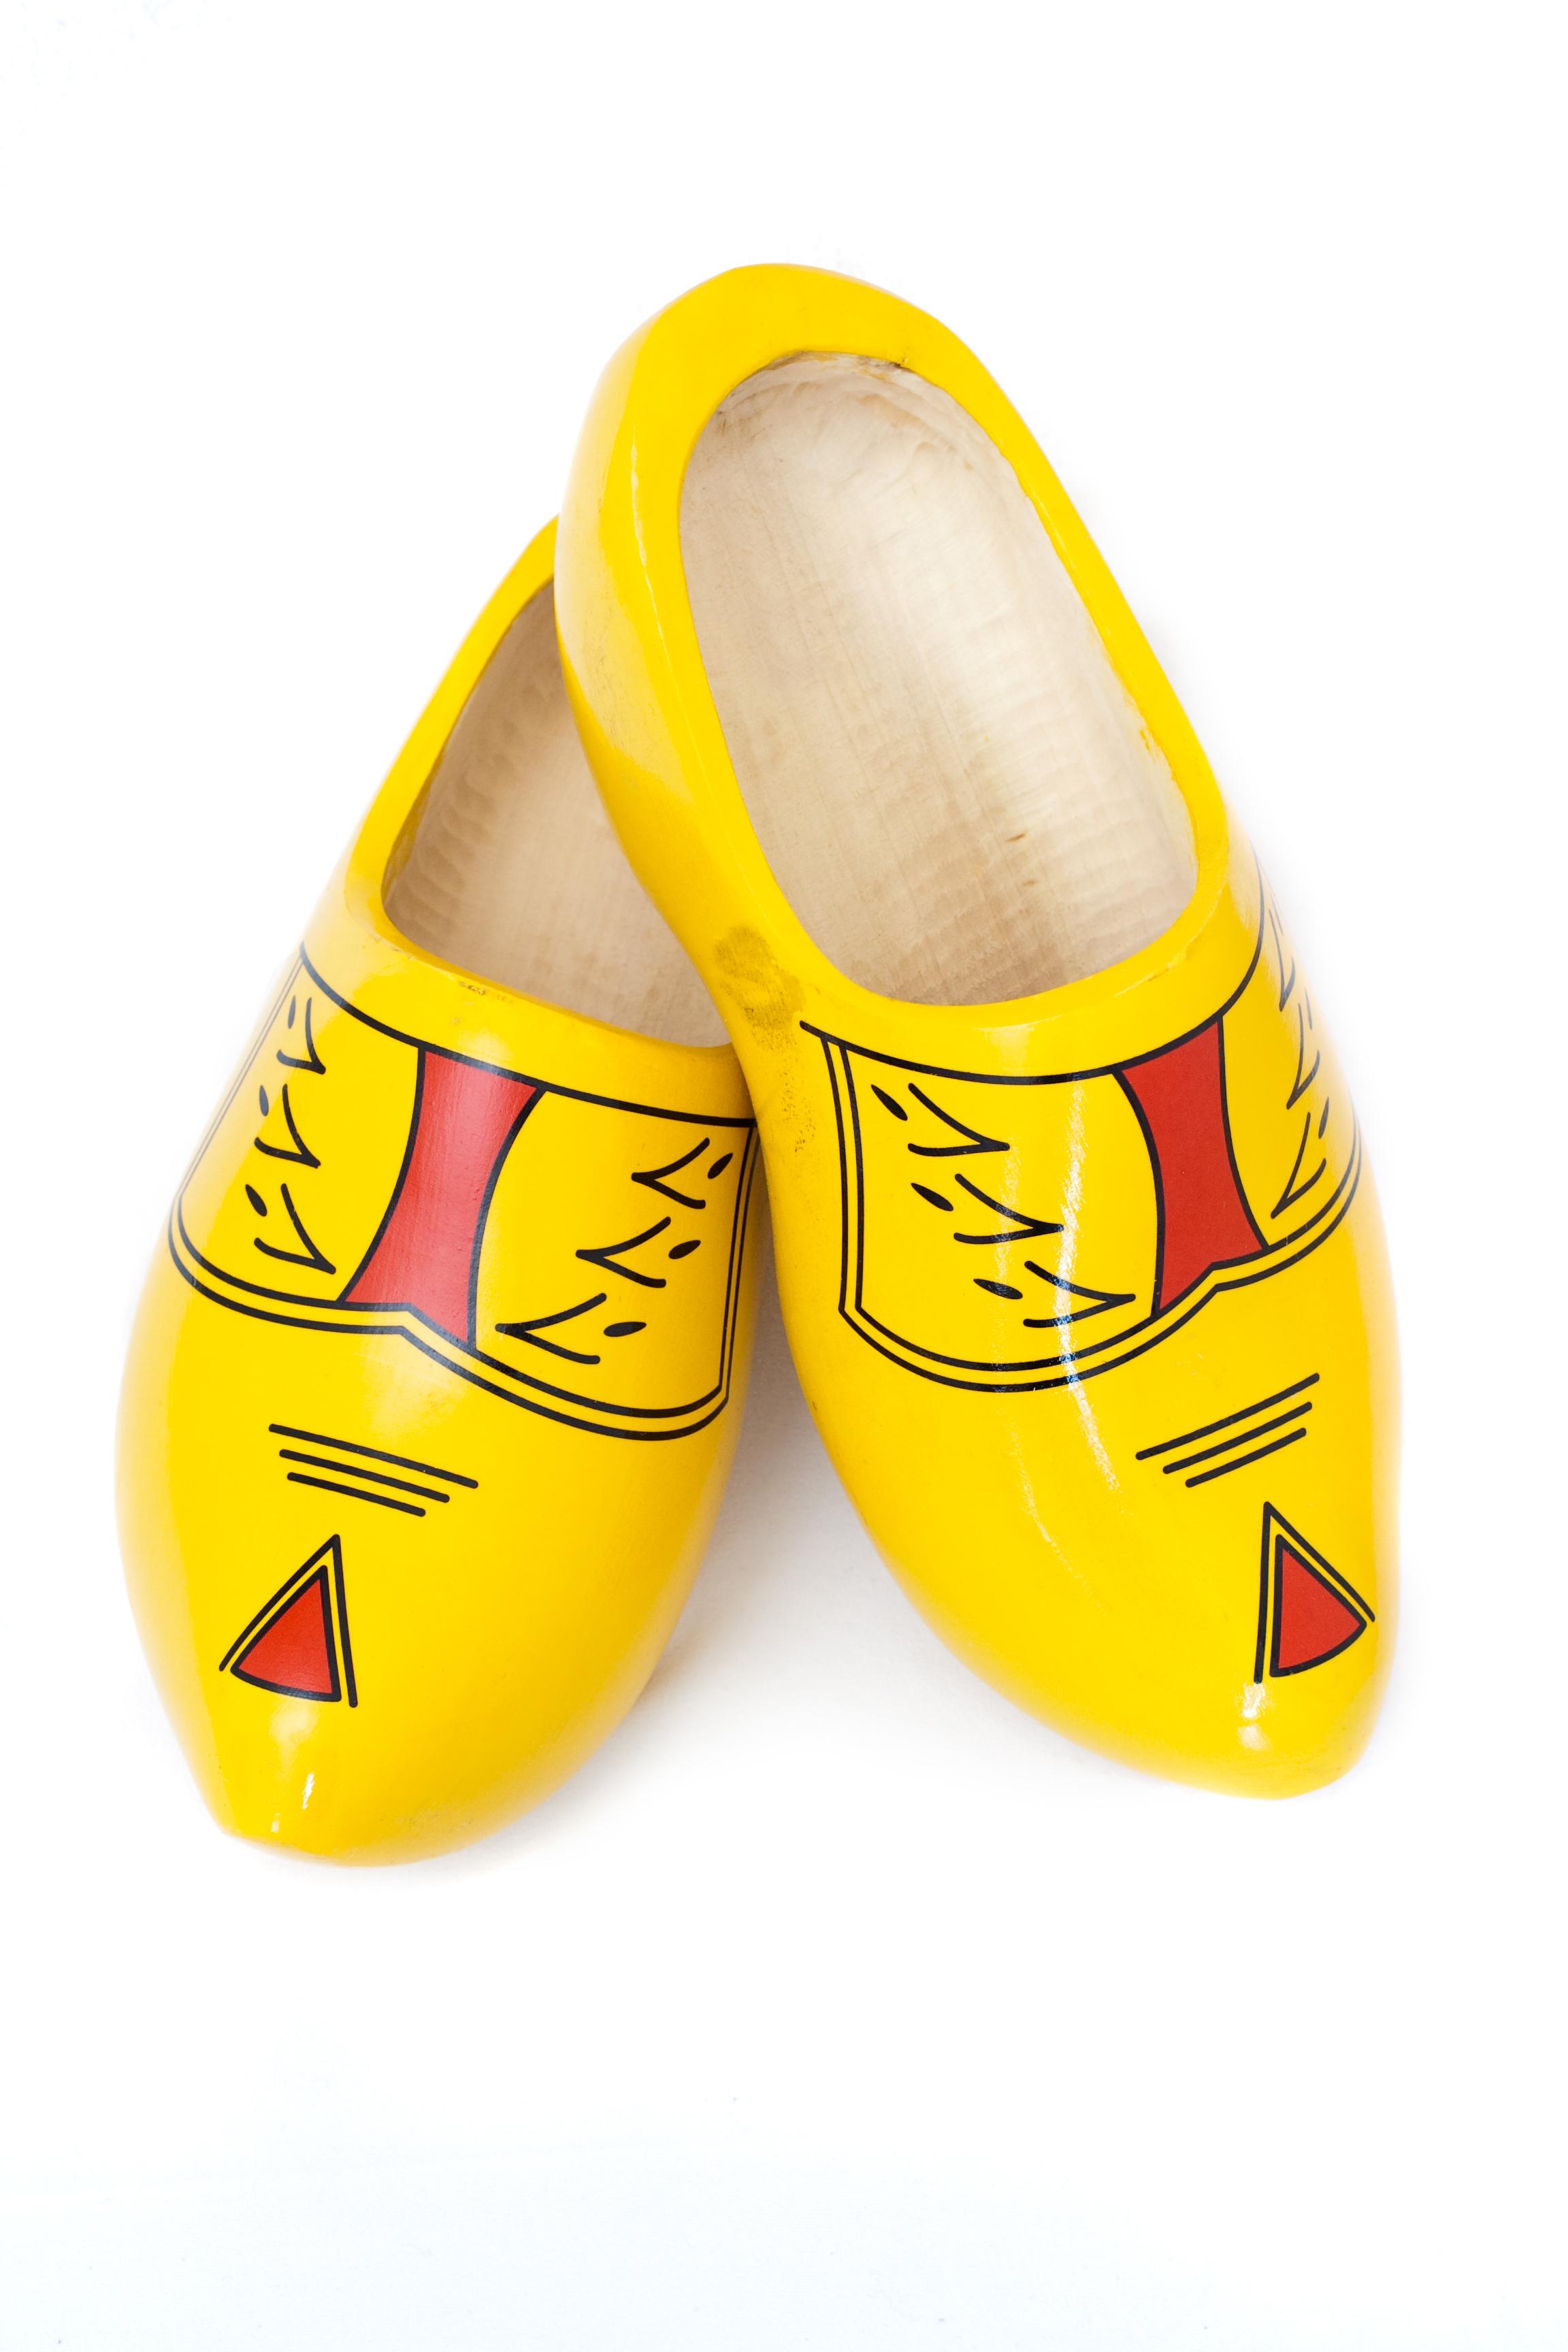 Clipart wooden shoes.